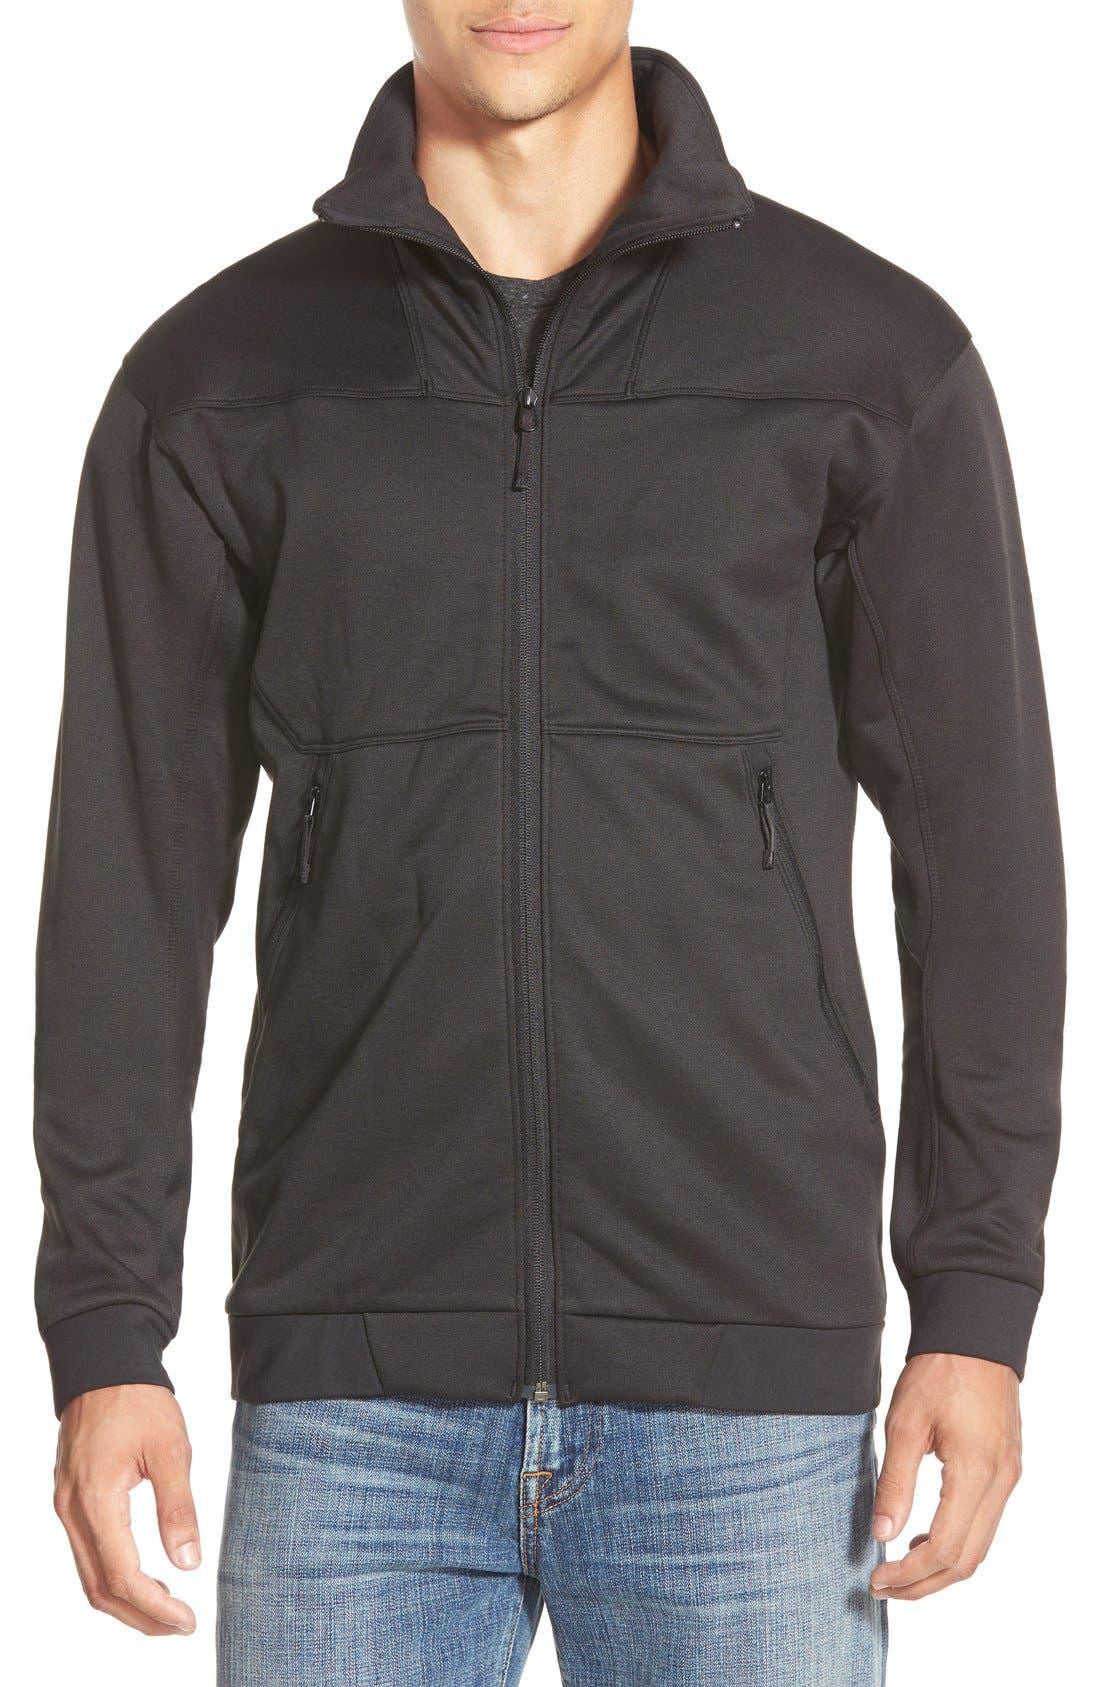 'Straibo' Midweight Technical Fleece Jacket,                             Main thumbnail 1, color,                             001